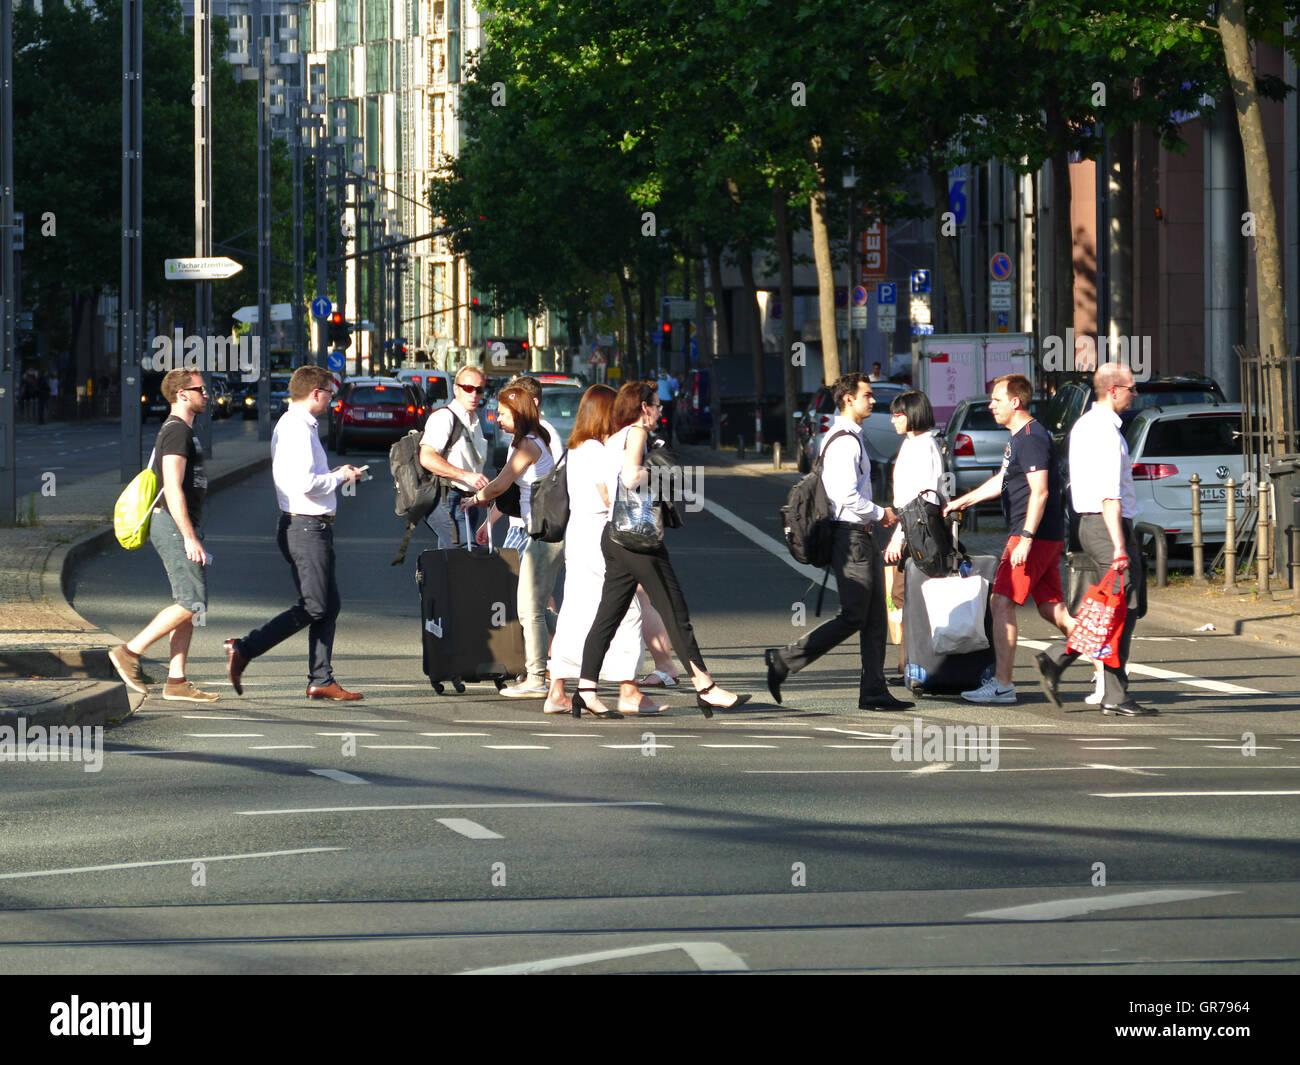 Pendler Rush-Hour Verkehr finanzielle Stadt Frankfurt am Main Deutschland Europa Stockbild